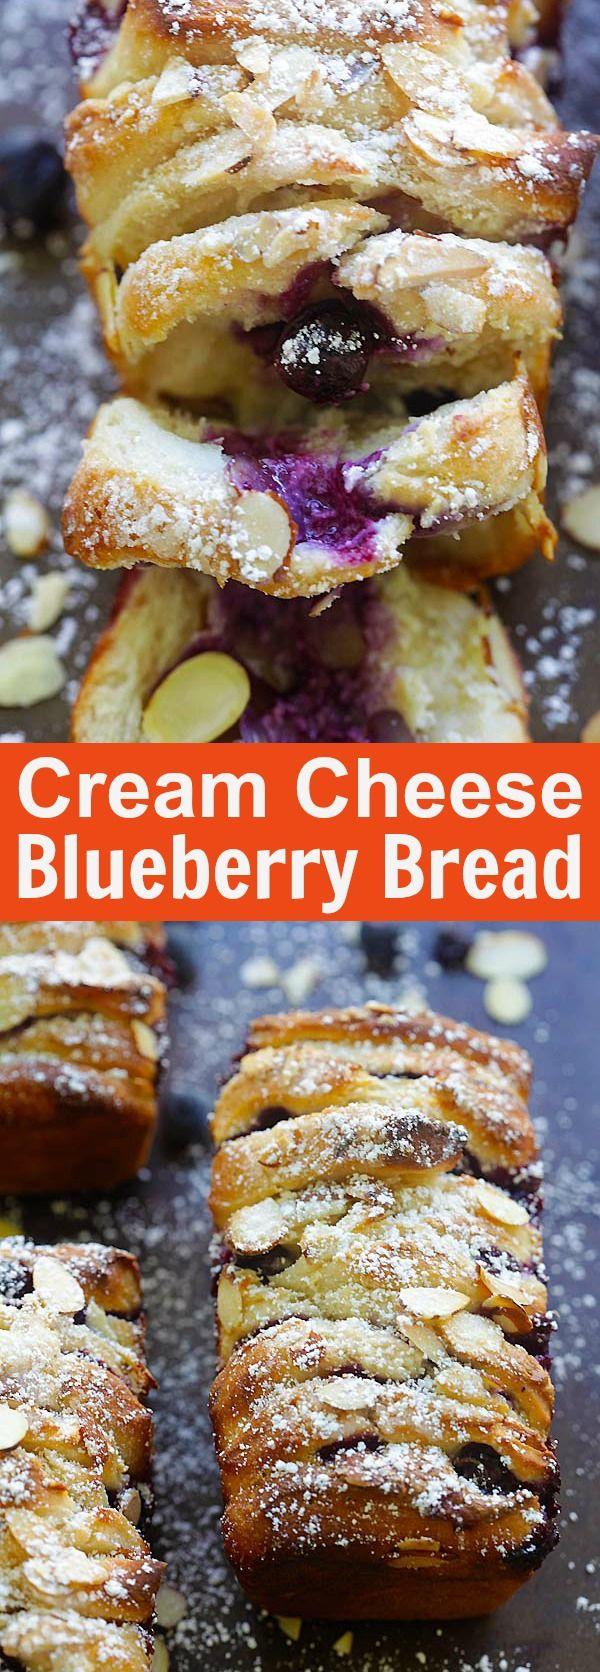 Blueberry-Cream Cheese Pull-Apart Bread – the best pull-apart bread loaded with cream cheese and blueberries. So delicious   rasamalaysia.com